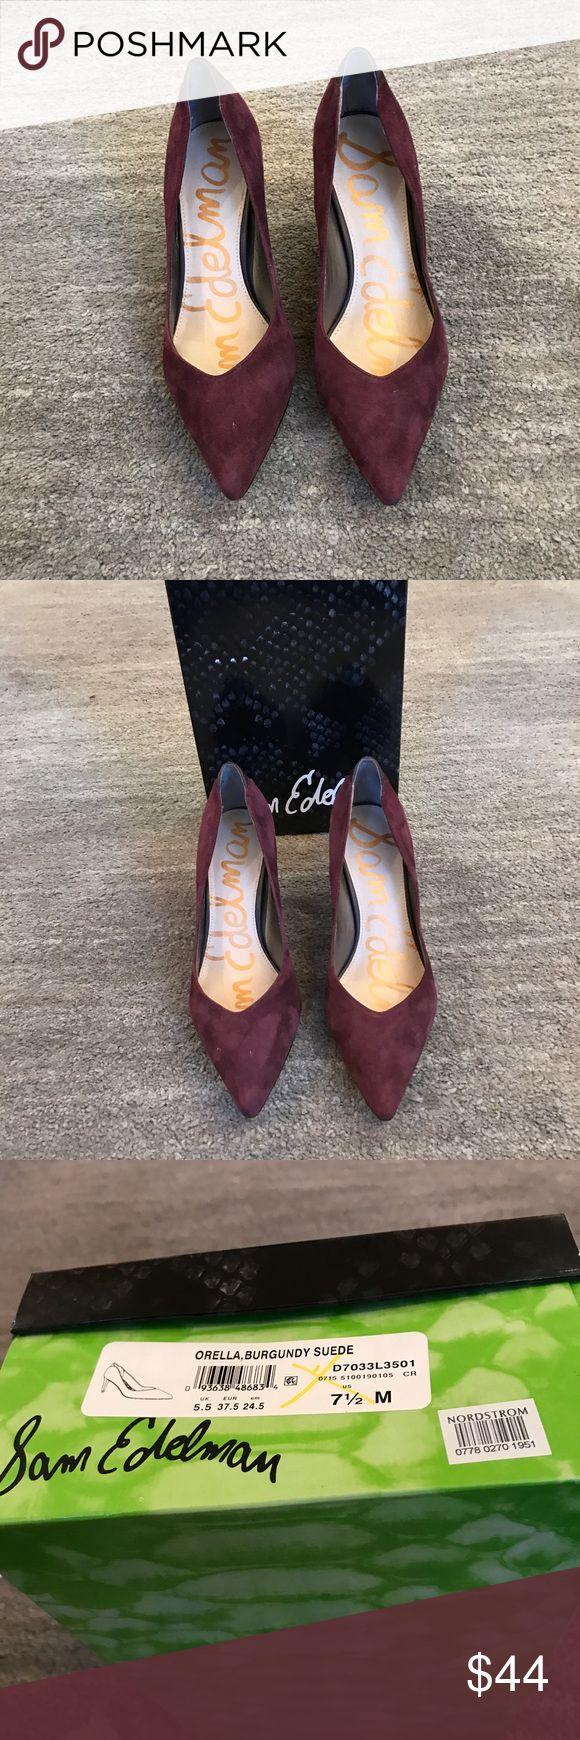 "Sam Edelman-worn once-Orella suede pump Sam Edelman Orella suede pump. Worn once.  Heel is 3"". Beautiful burgundy suede. Box included. Sam Edleman Shoes Heels"